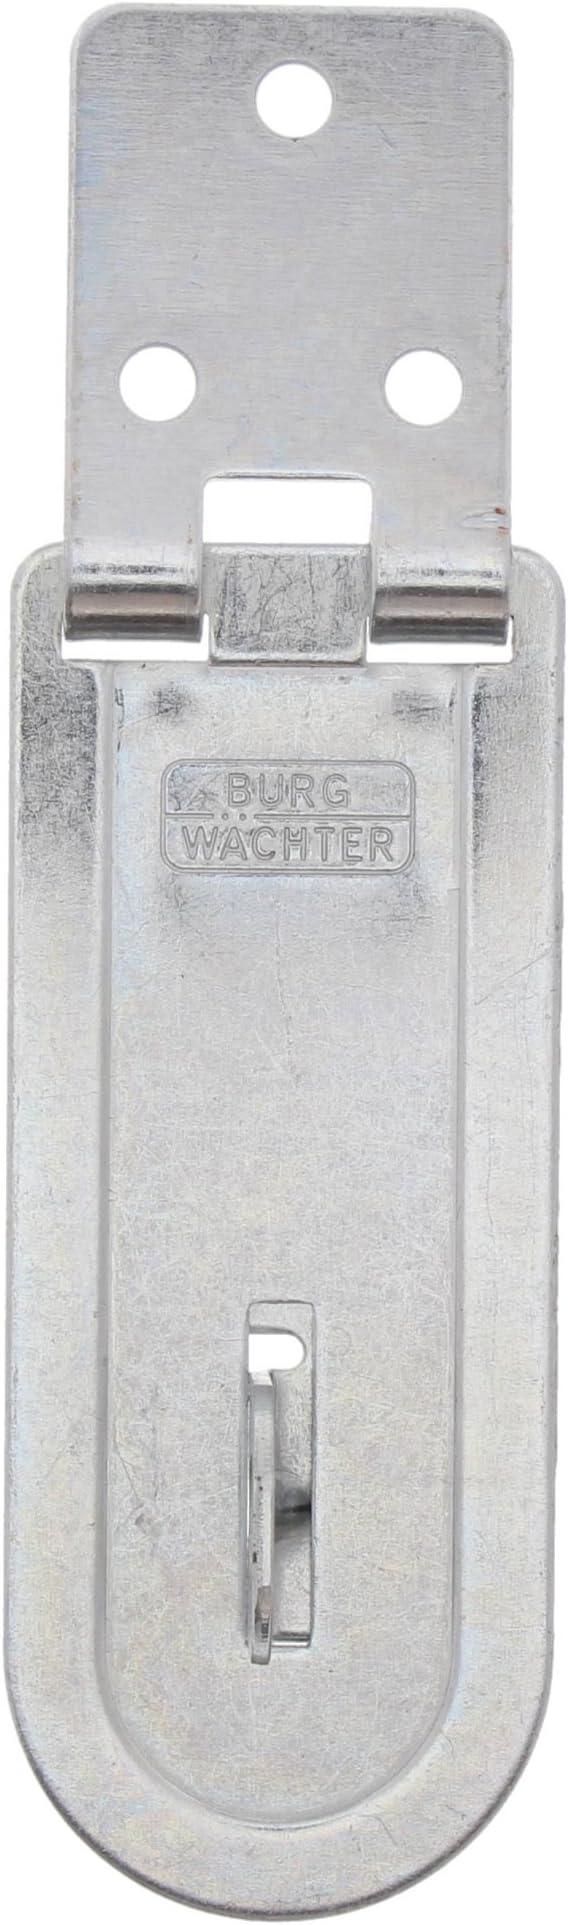 Burg Wachter Hasp /& Staple 120mm